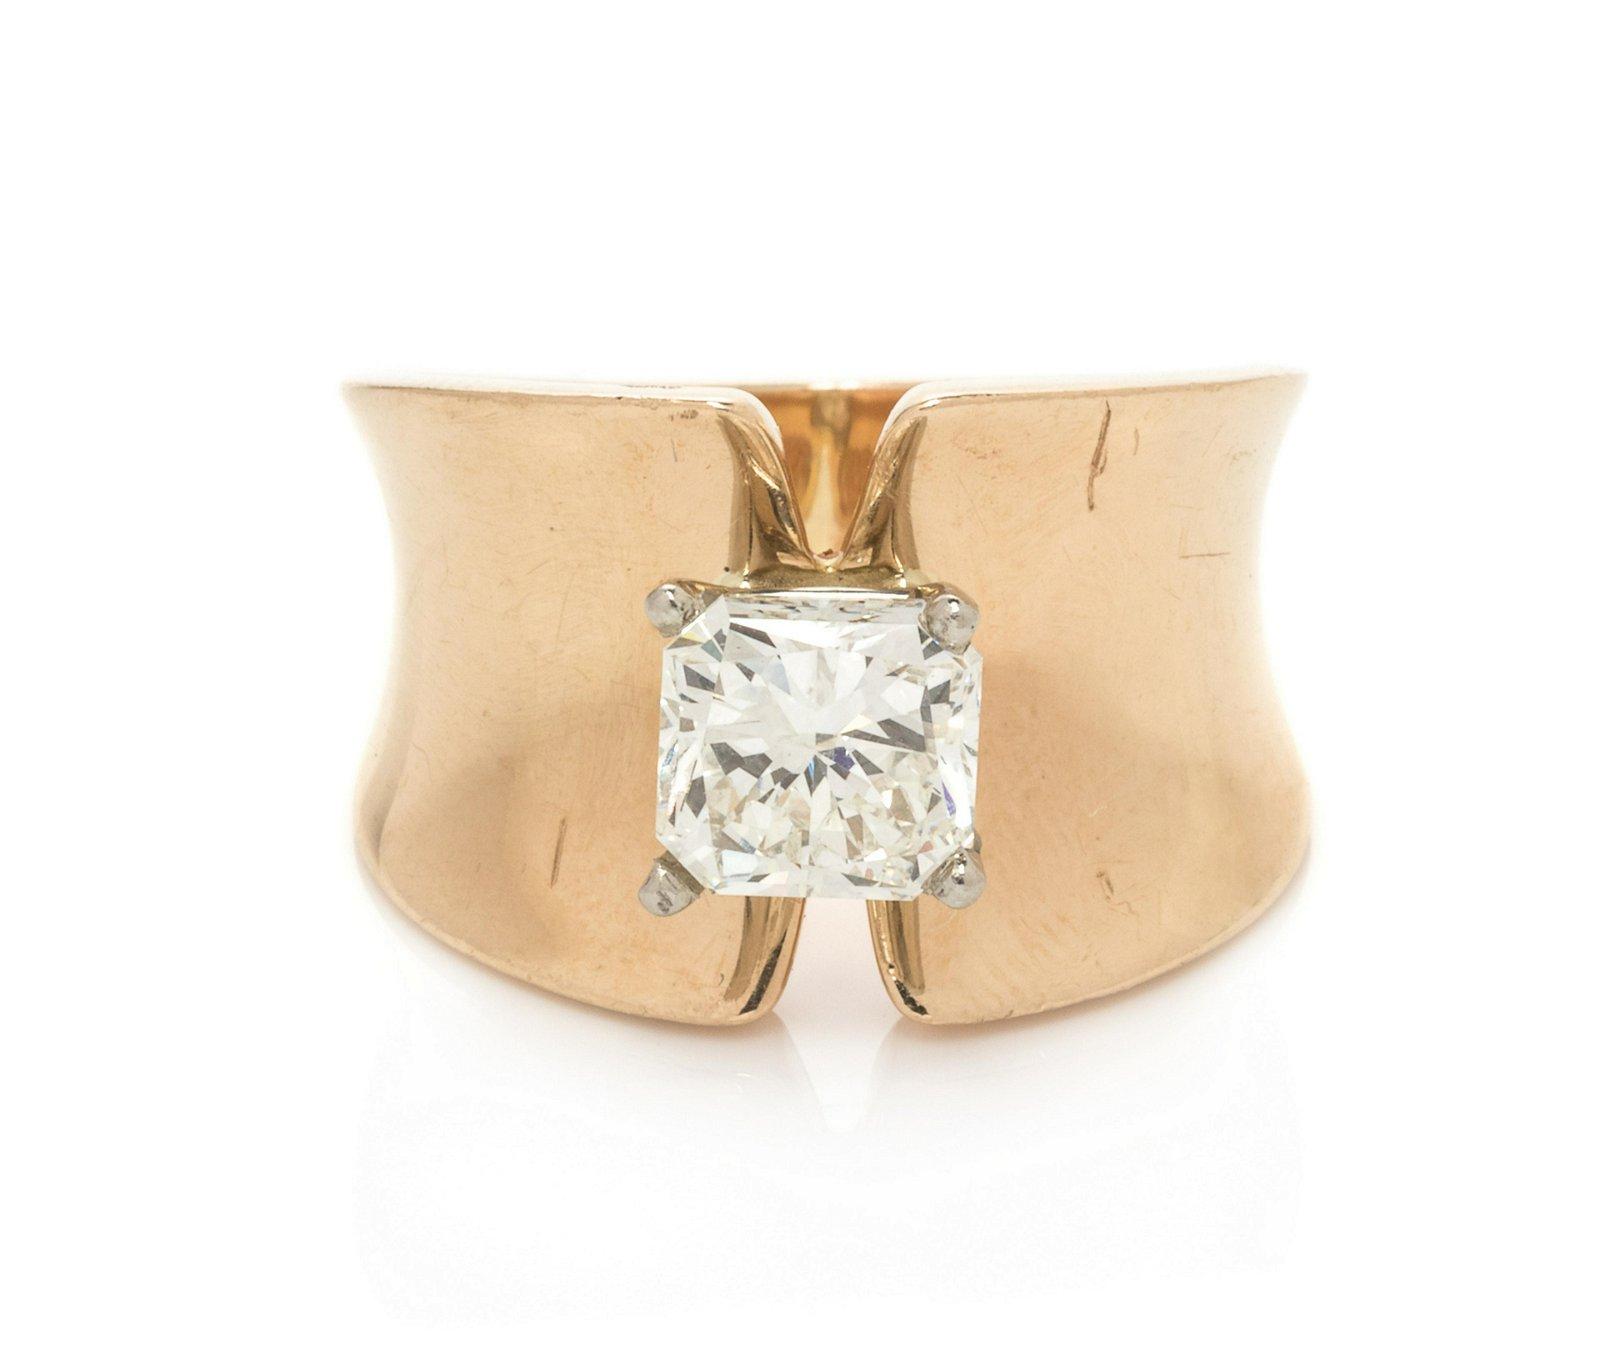 A 14 Karat Yellow Gold and Diamond Ring,